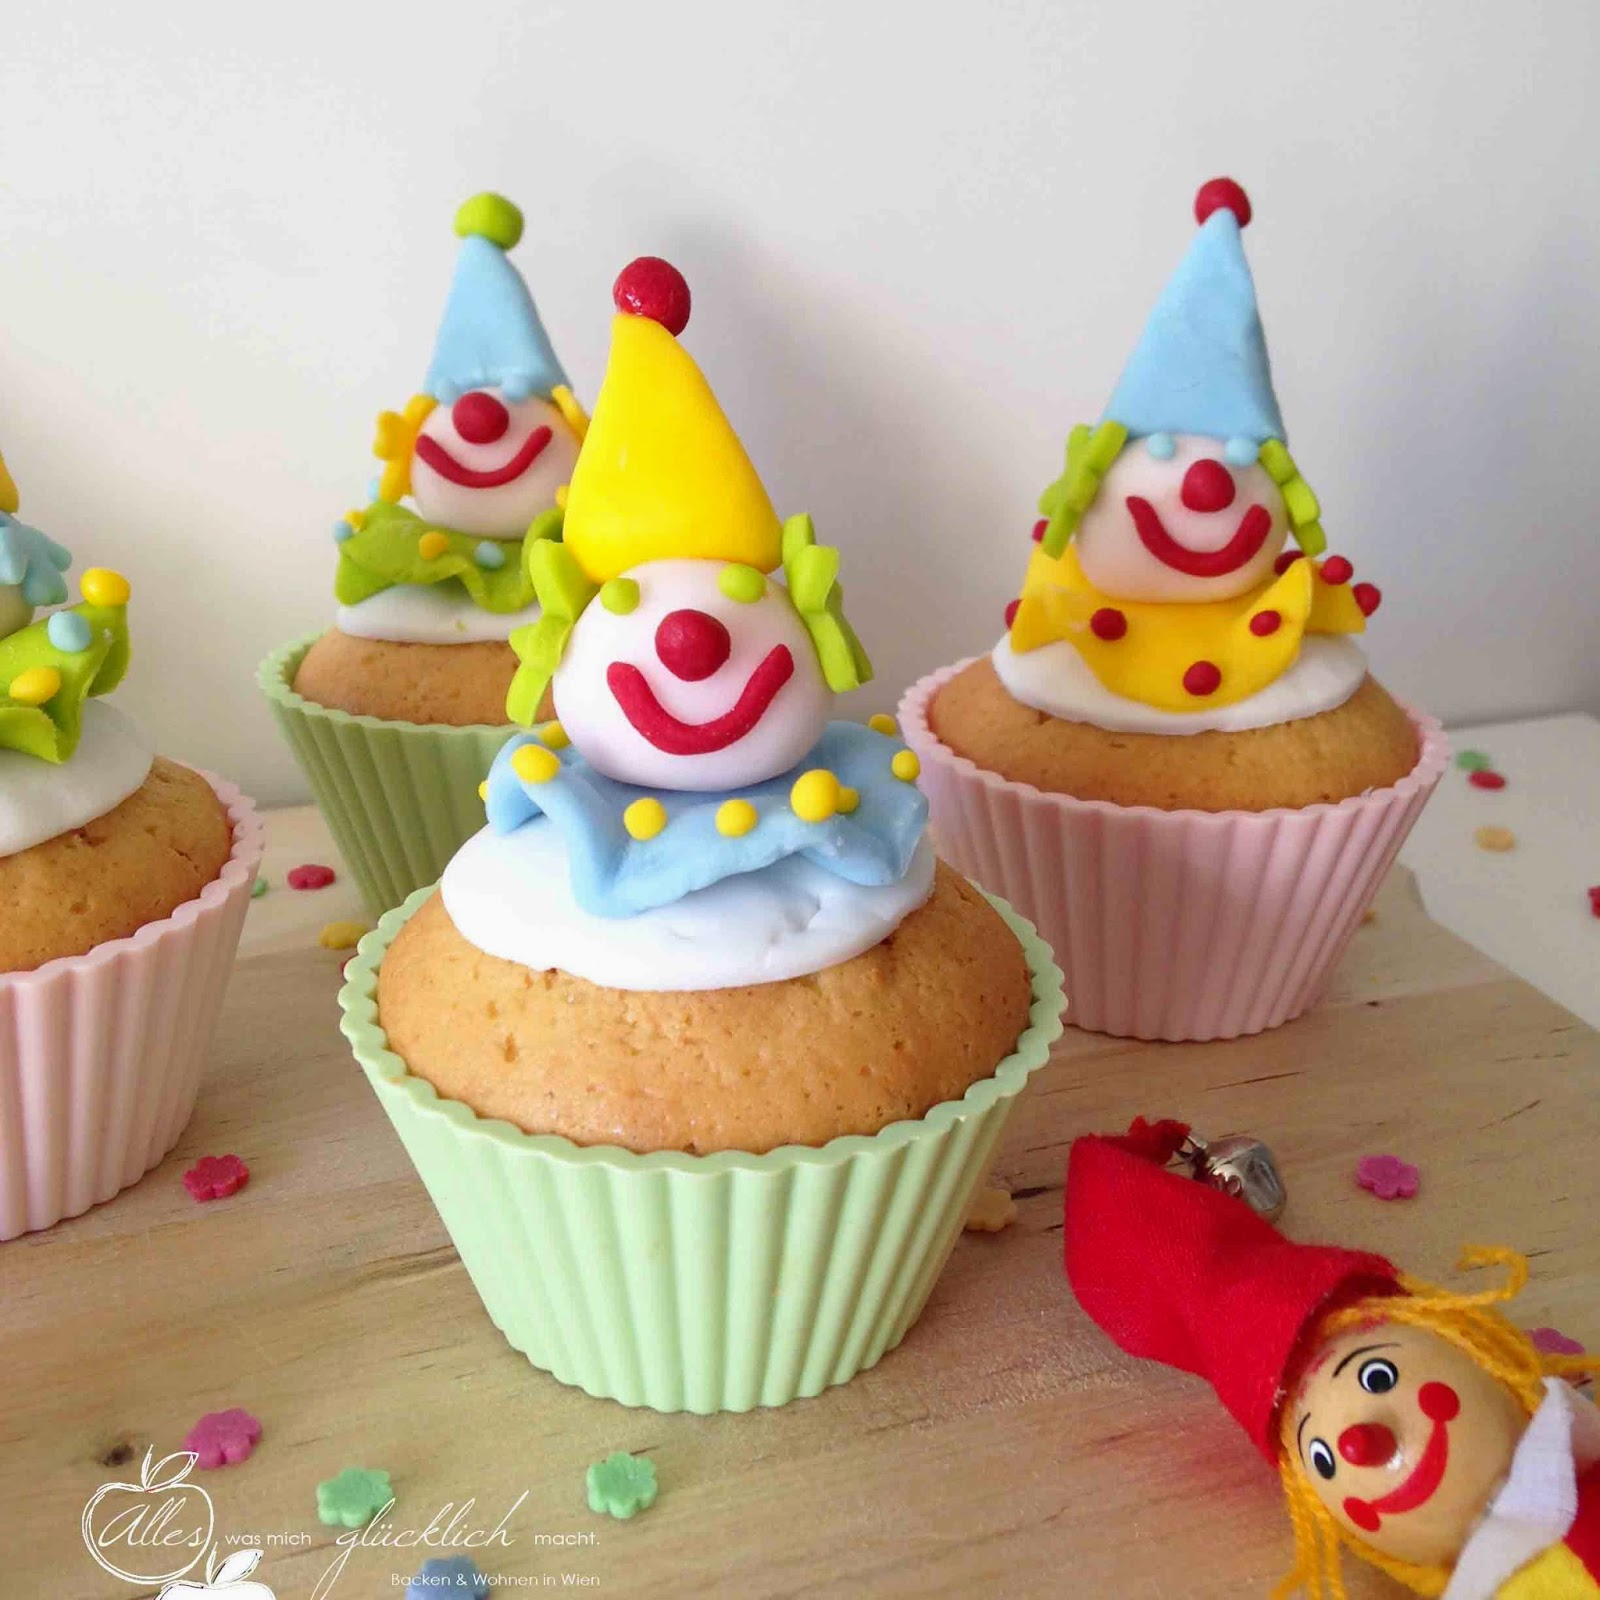 alles was mich gl cklich macht lustig fruchtige clown cupcakes mit maracuja f llung. Black Bedroom Furniture Sets. Home Design Ideas